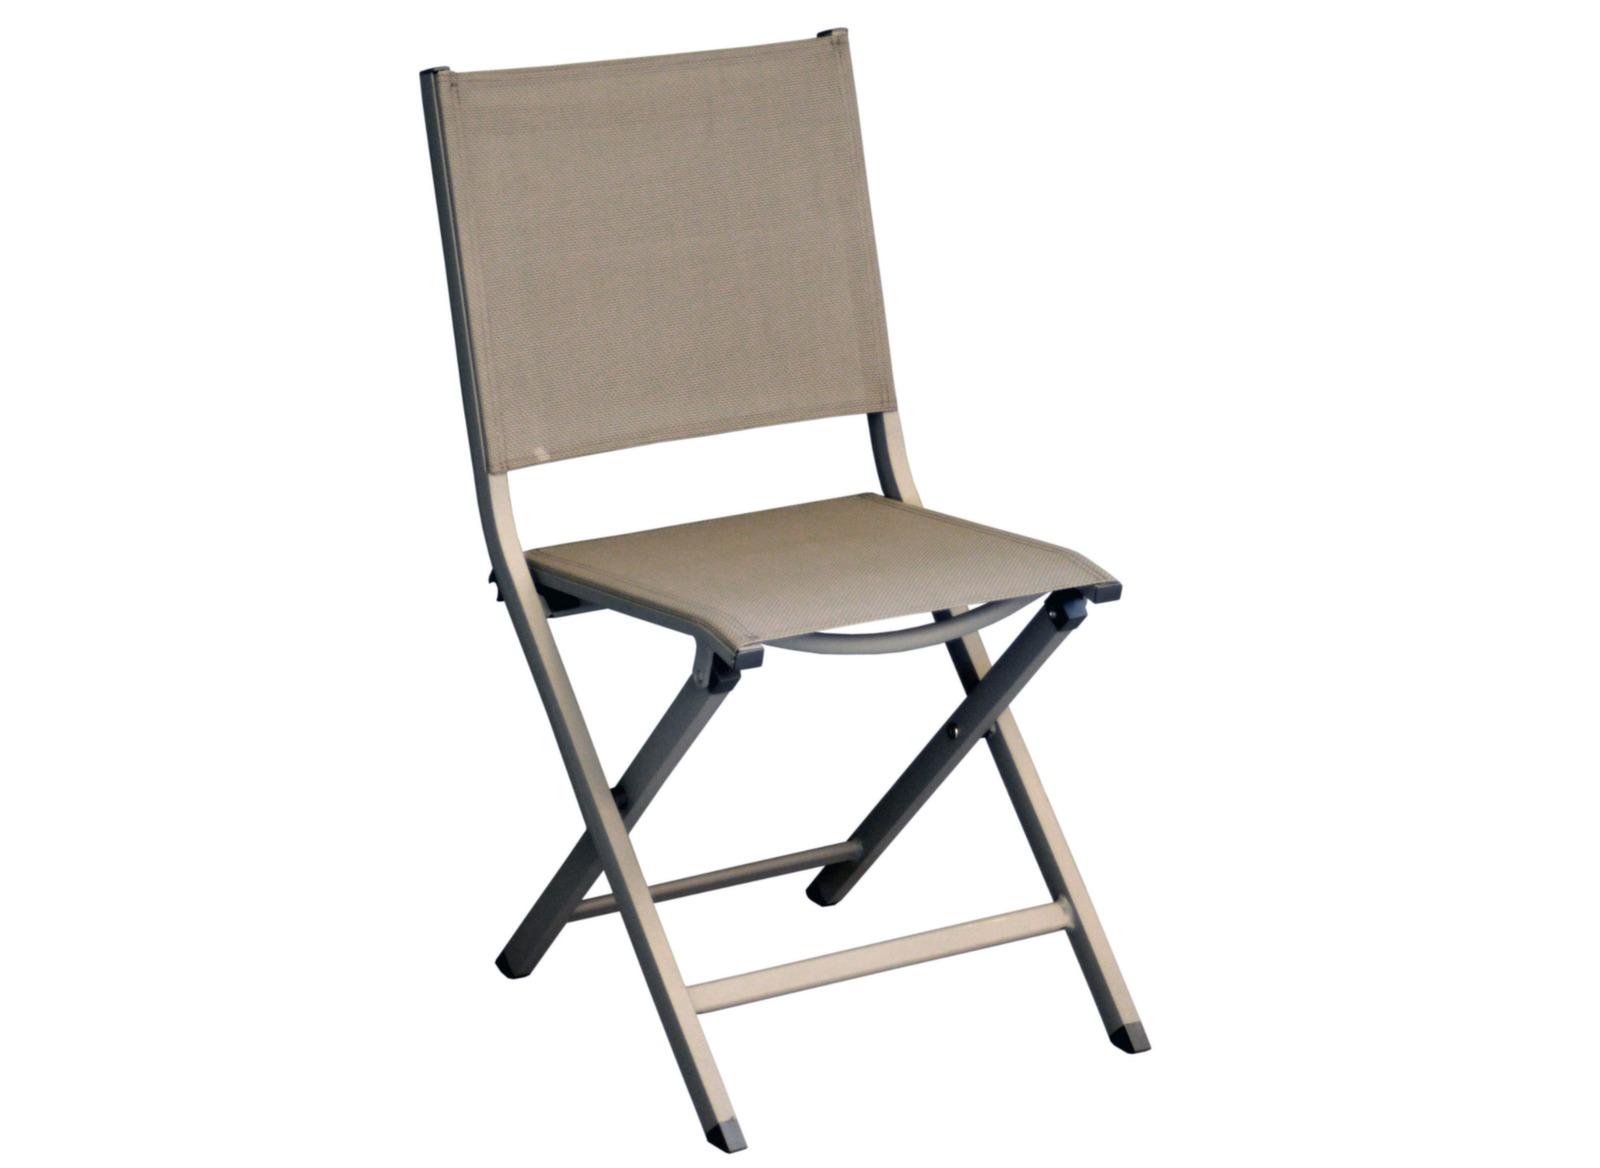 Chaises de jardin en aluminium Thema - Proloisirs